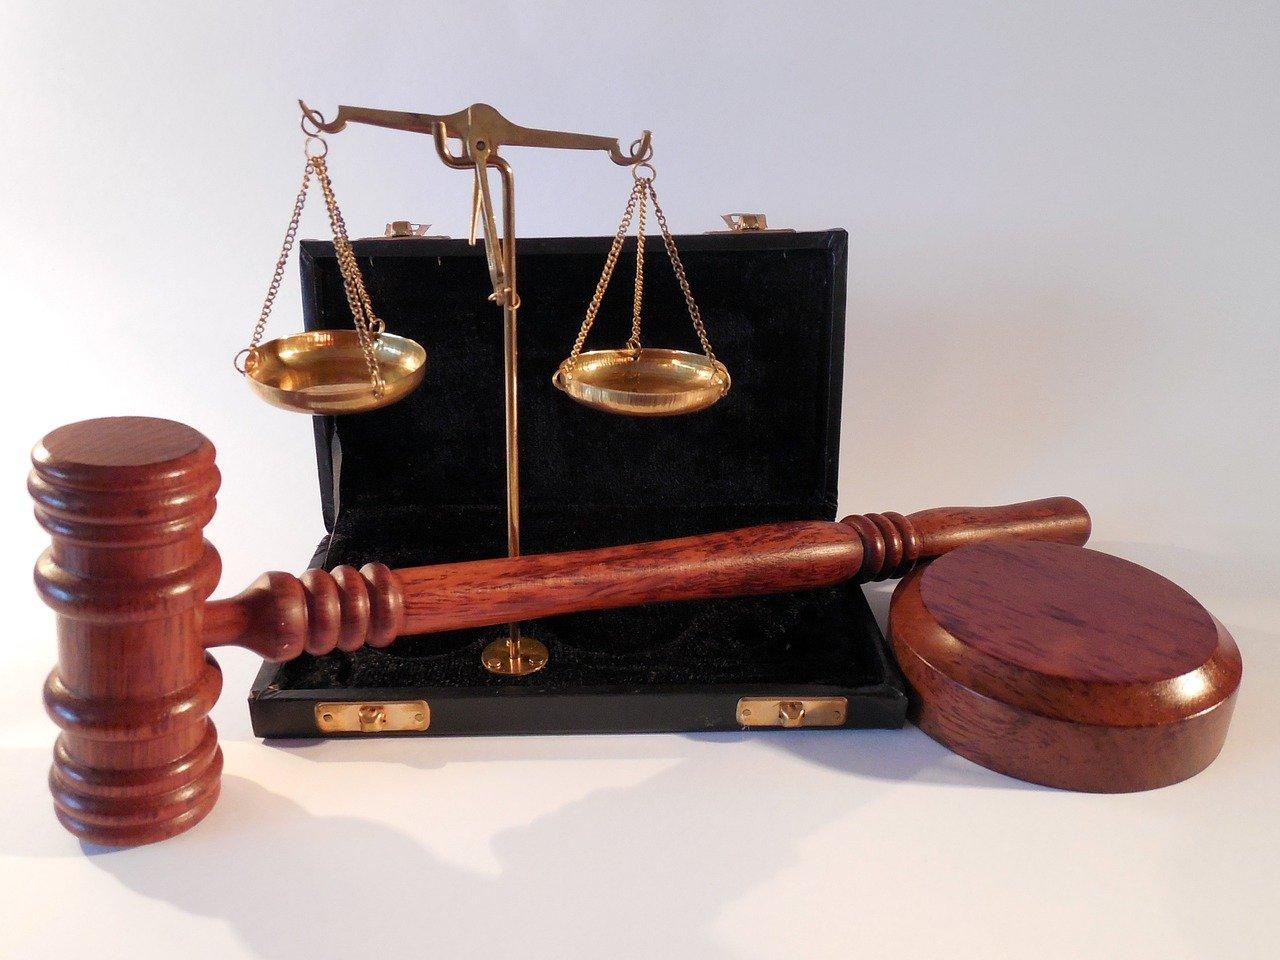 Martillo, Horizontales, Tribunal